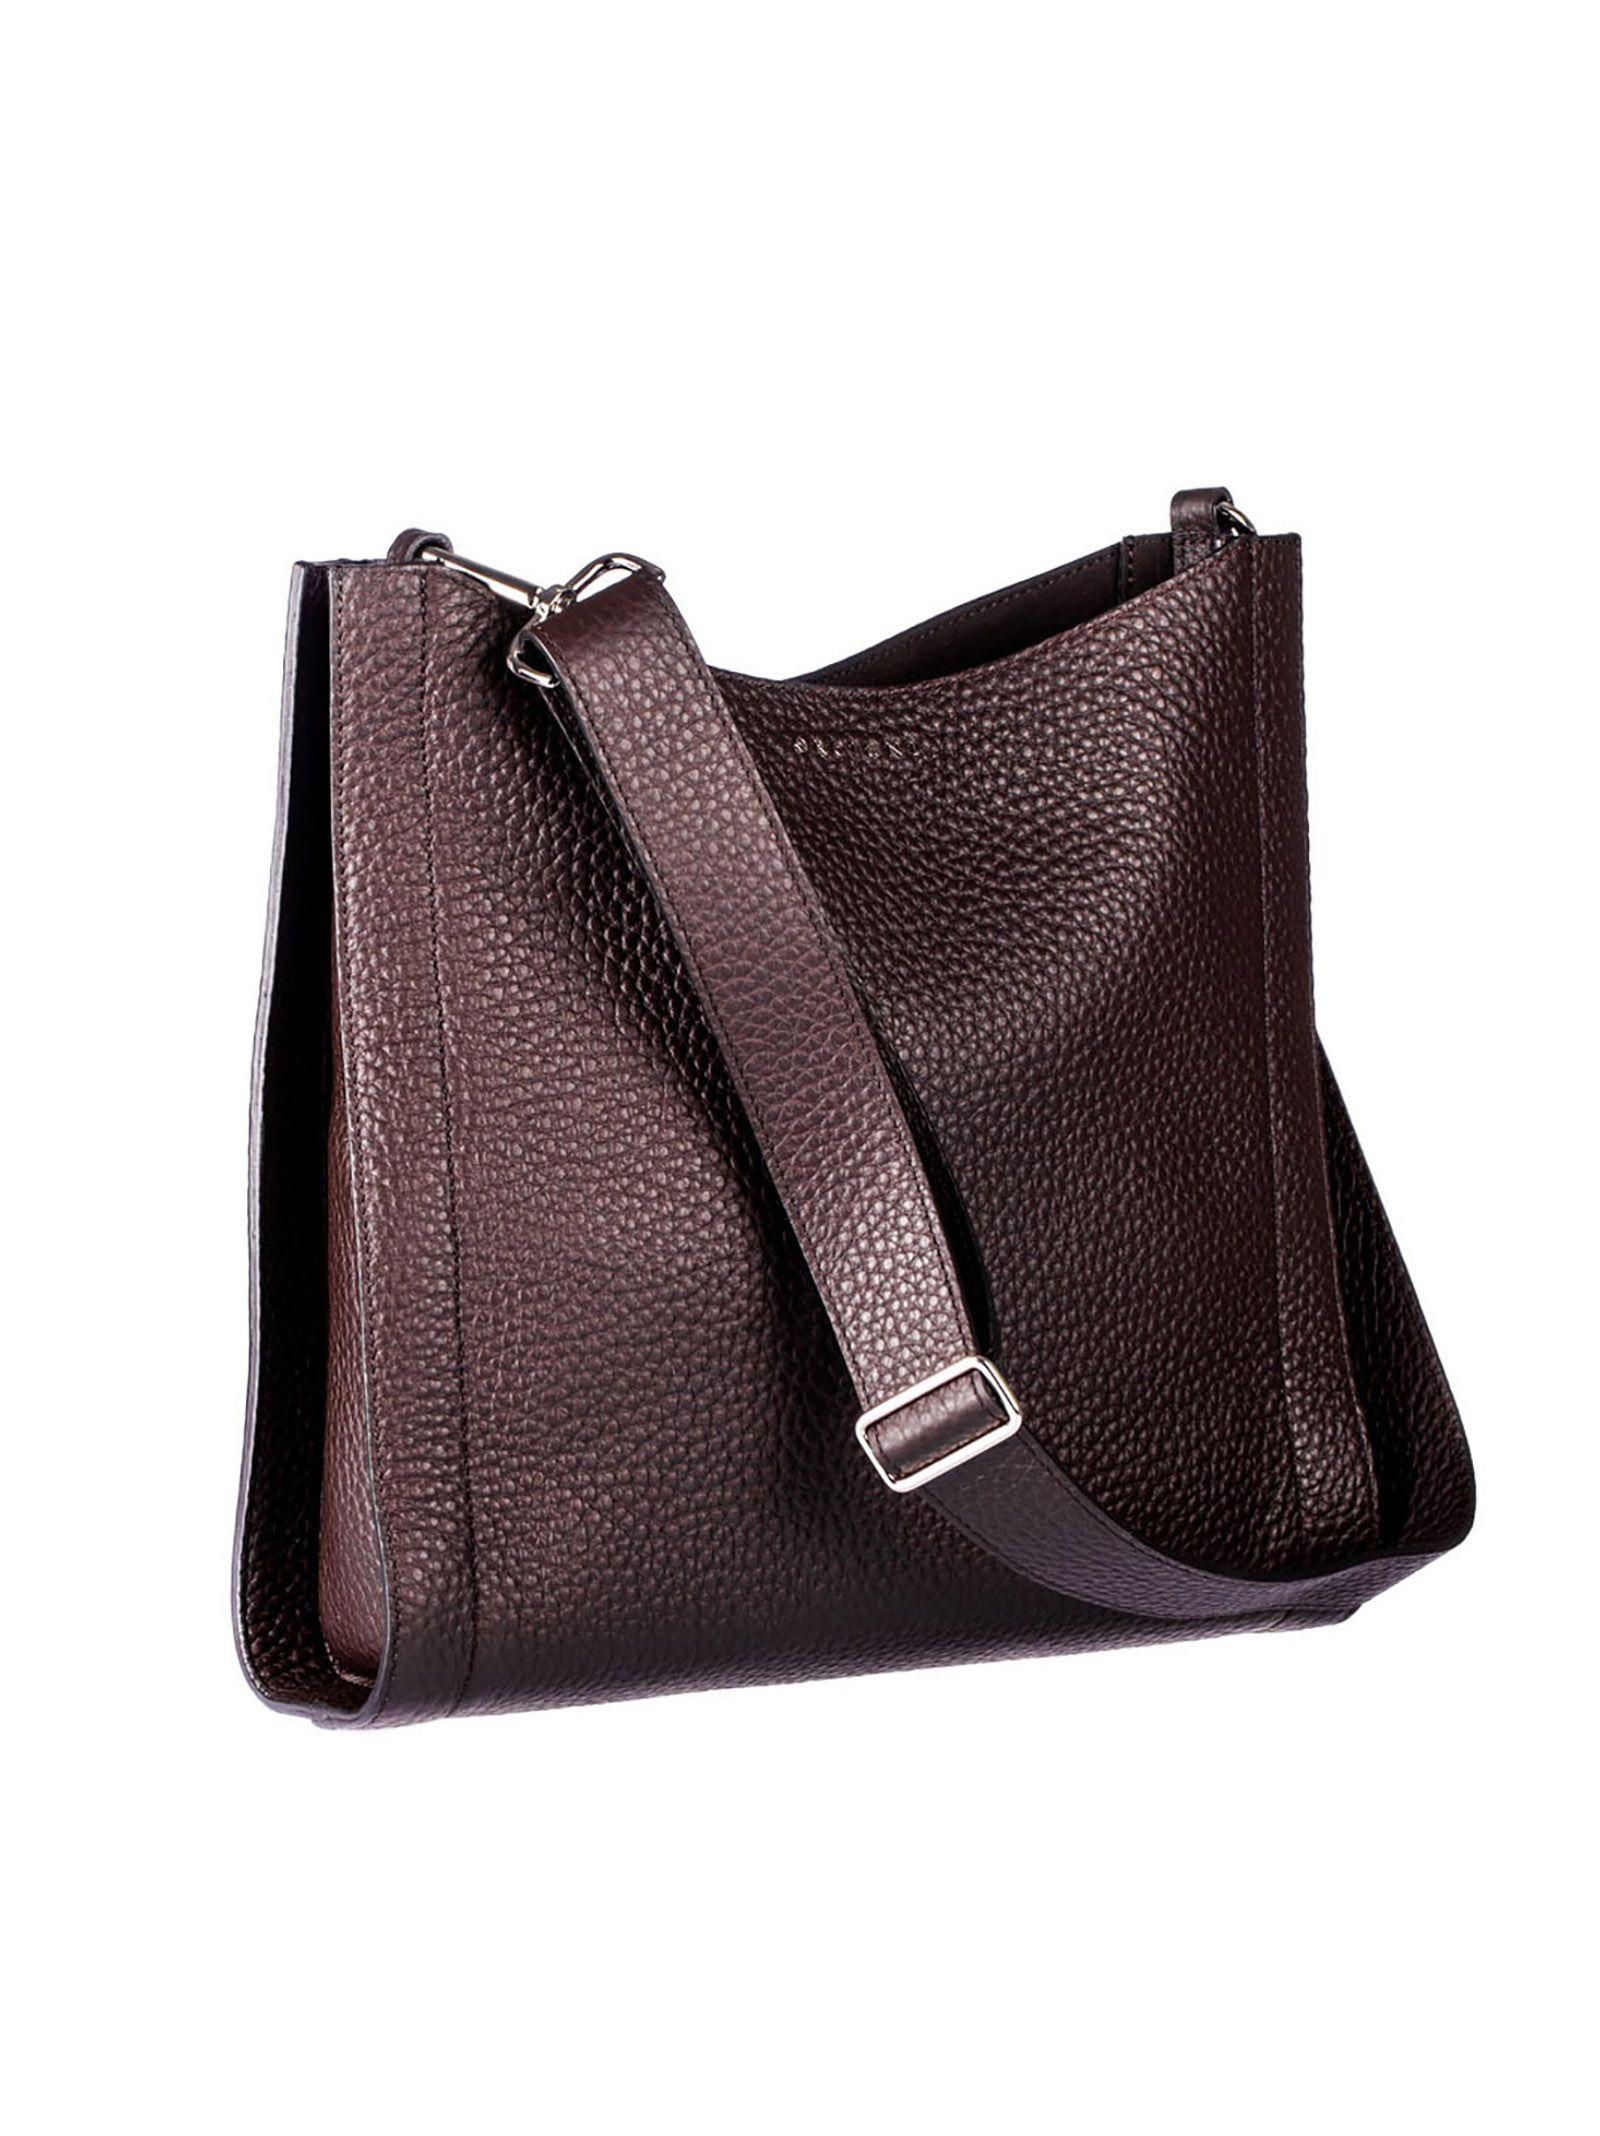 Orciani Soft Shopper Bag